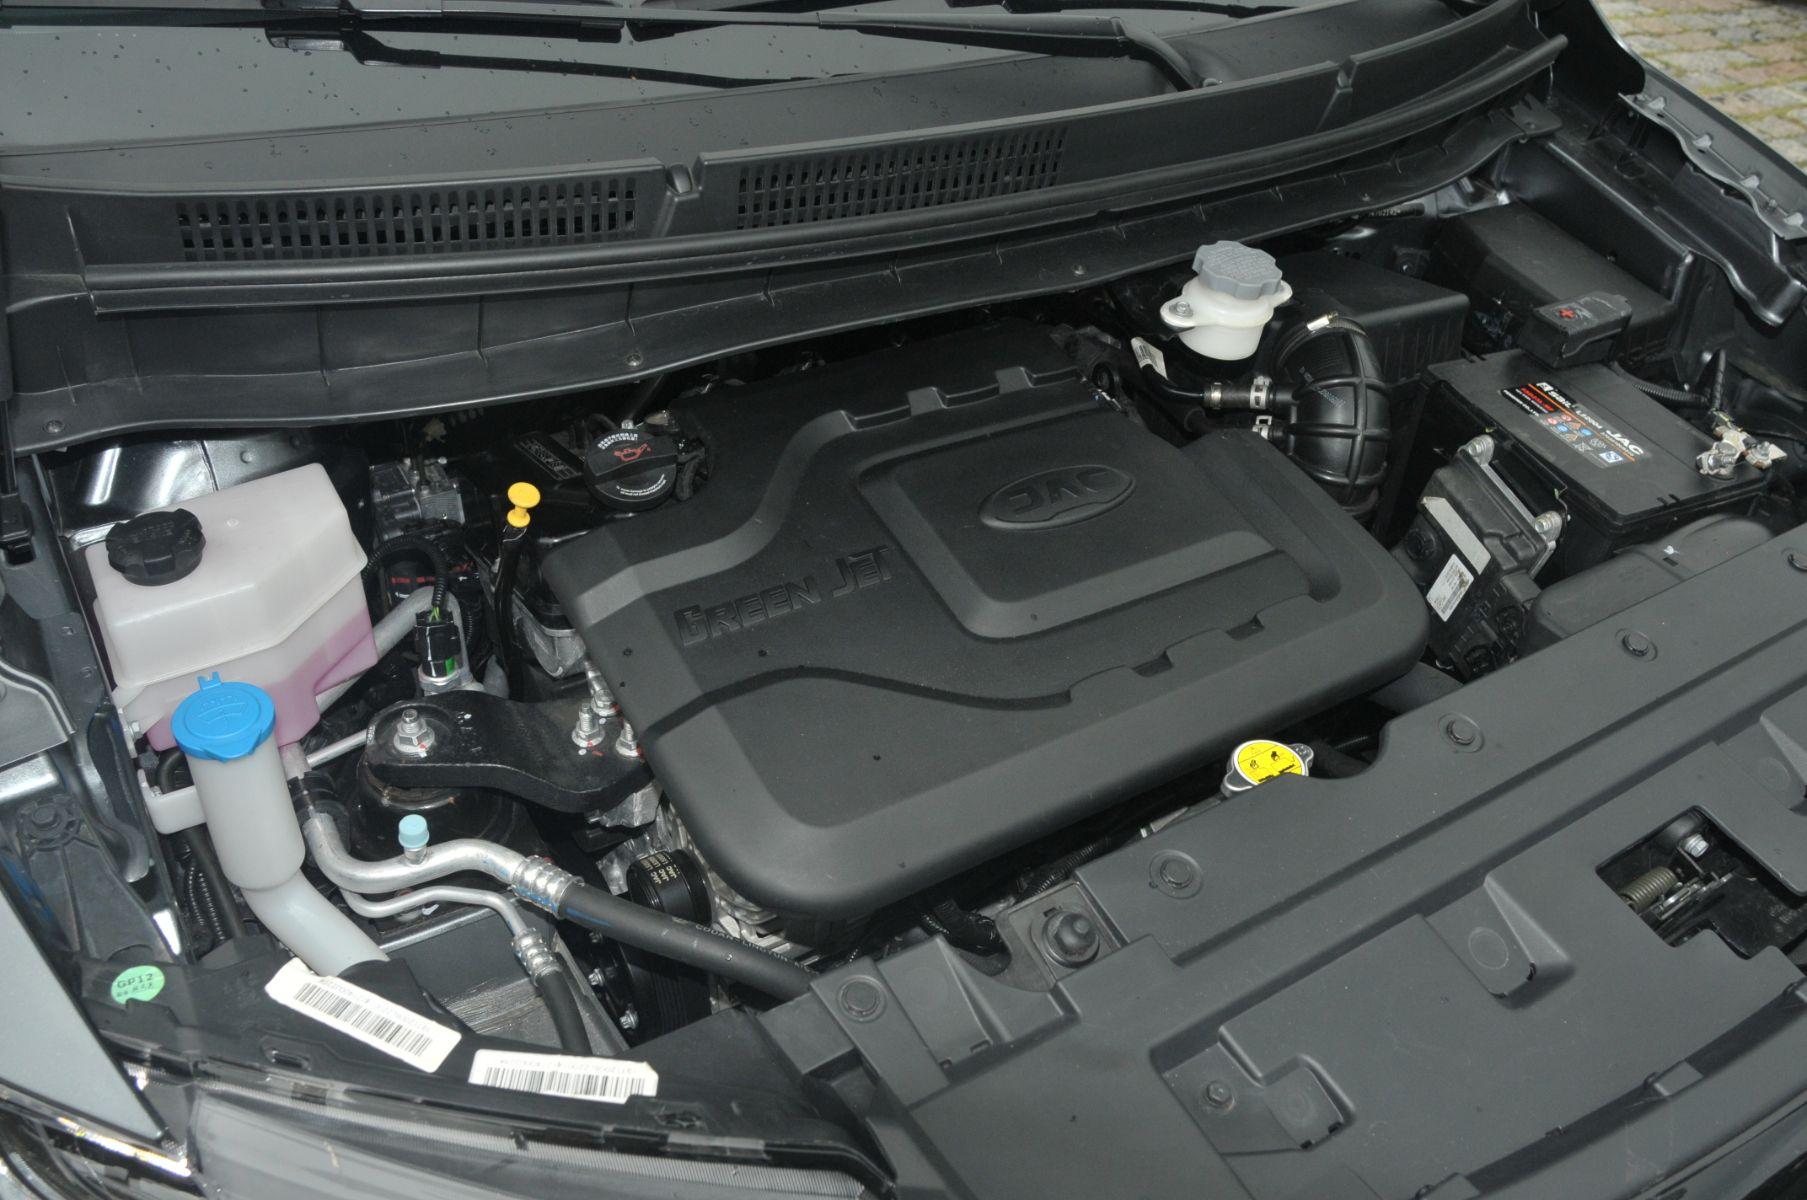 motor 1.6 movido a gasolina do jac t50